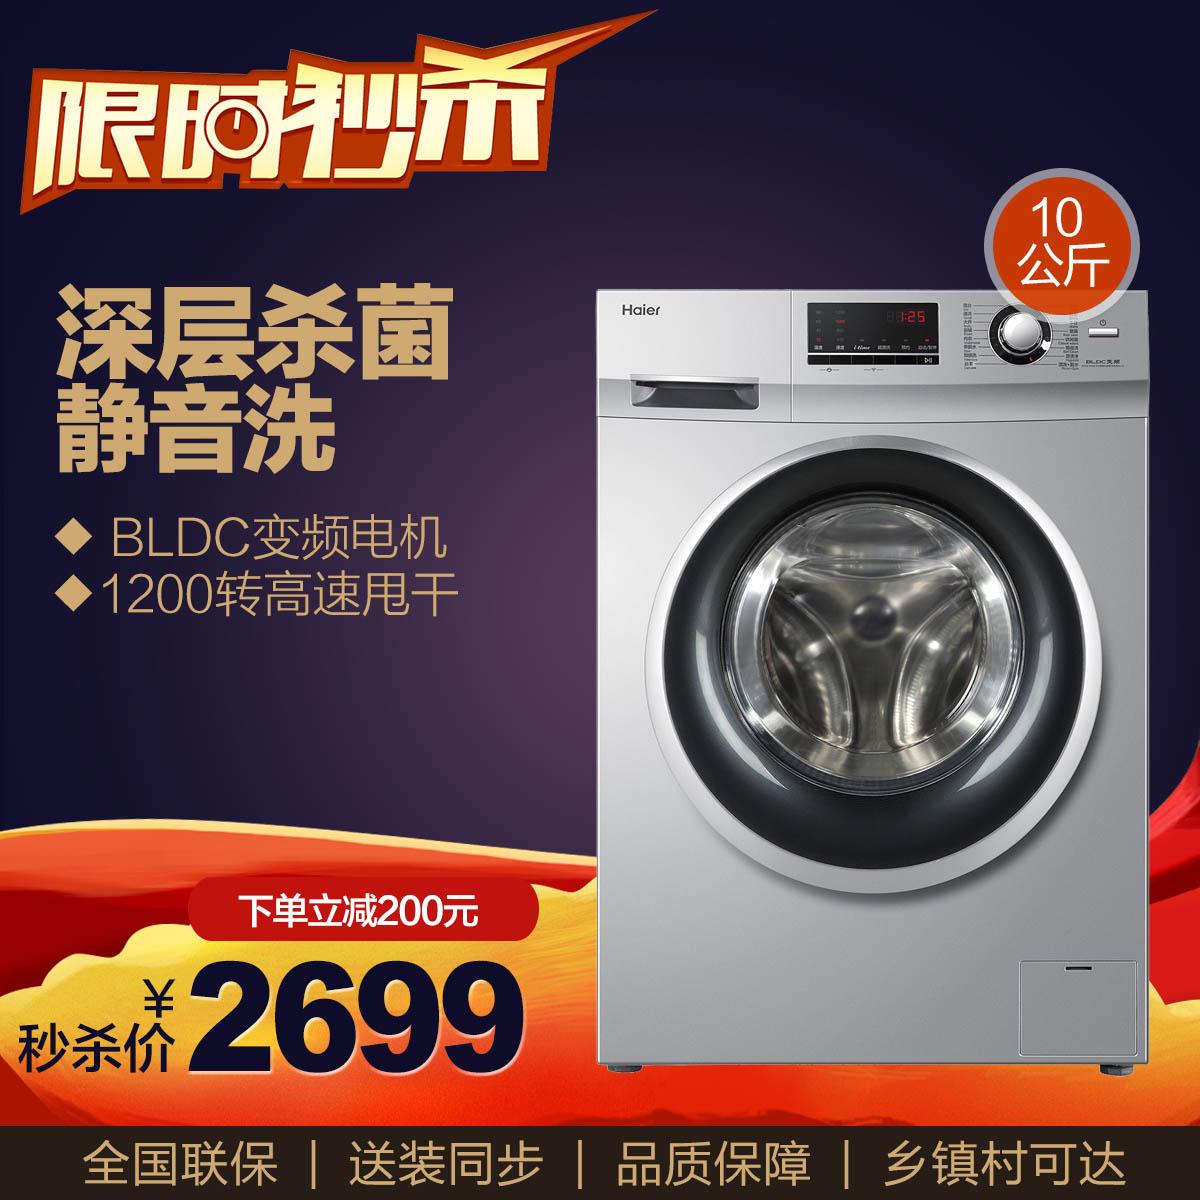 EG10012BKX839SU1 10公斤智能变频大容量滚筒洗衣机